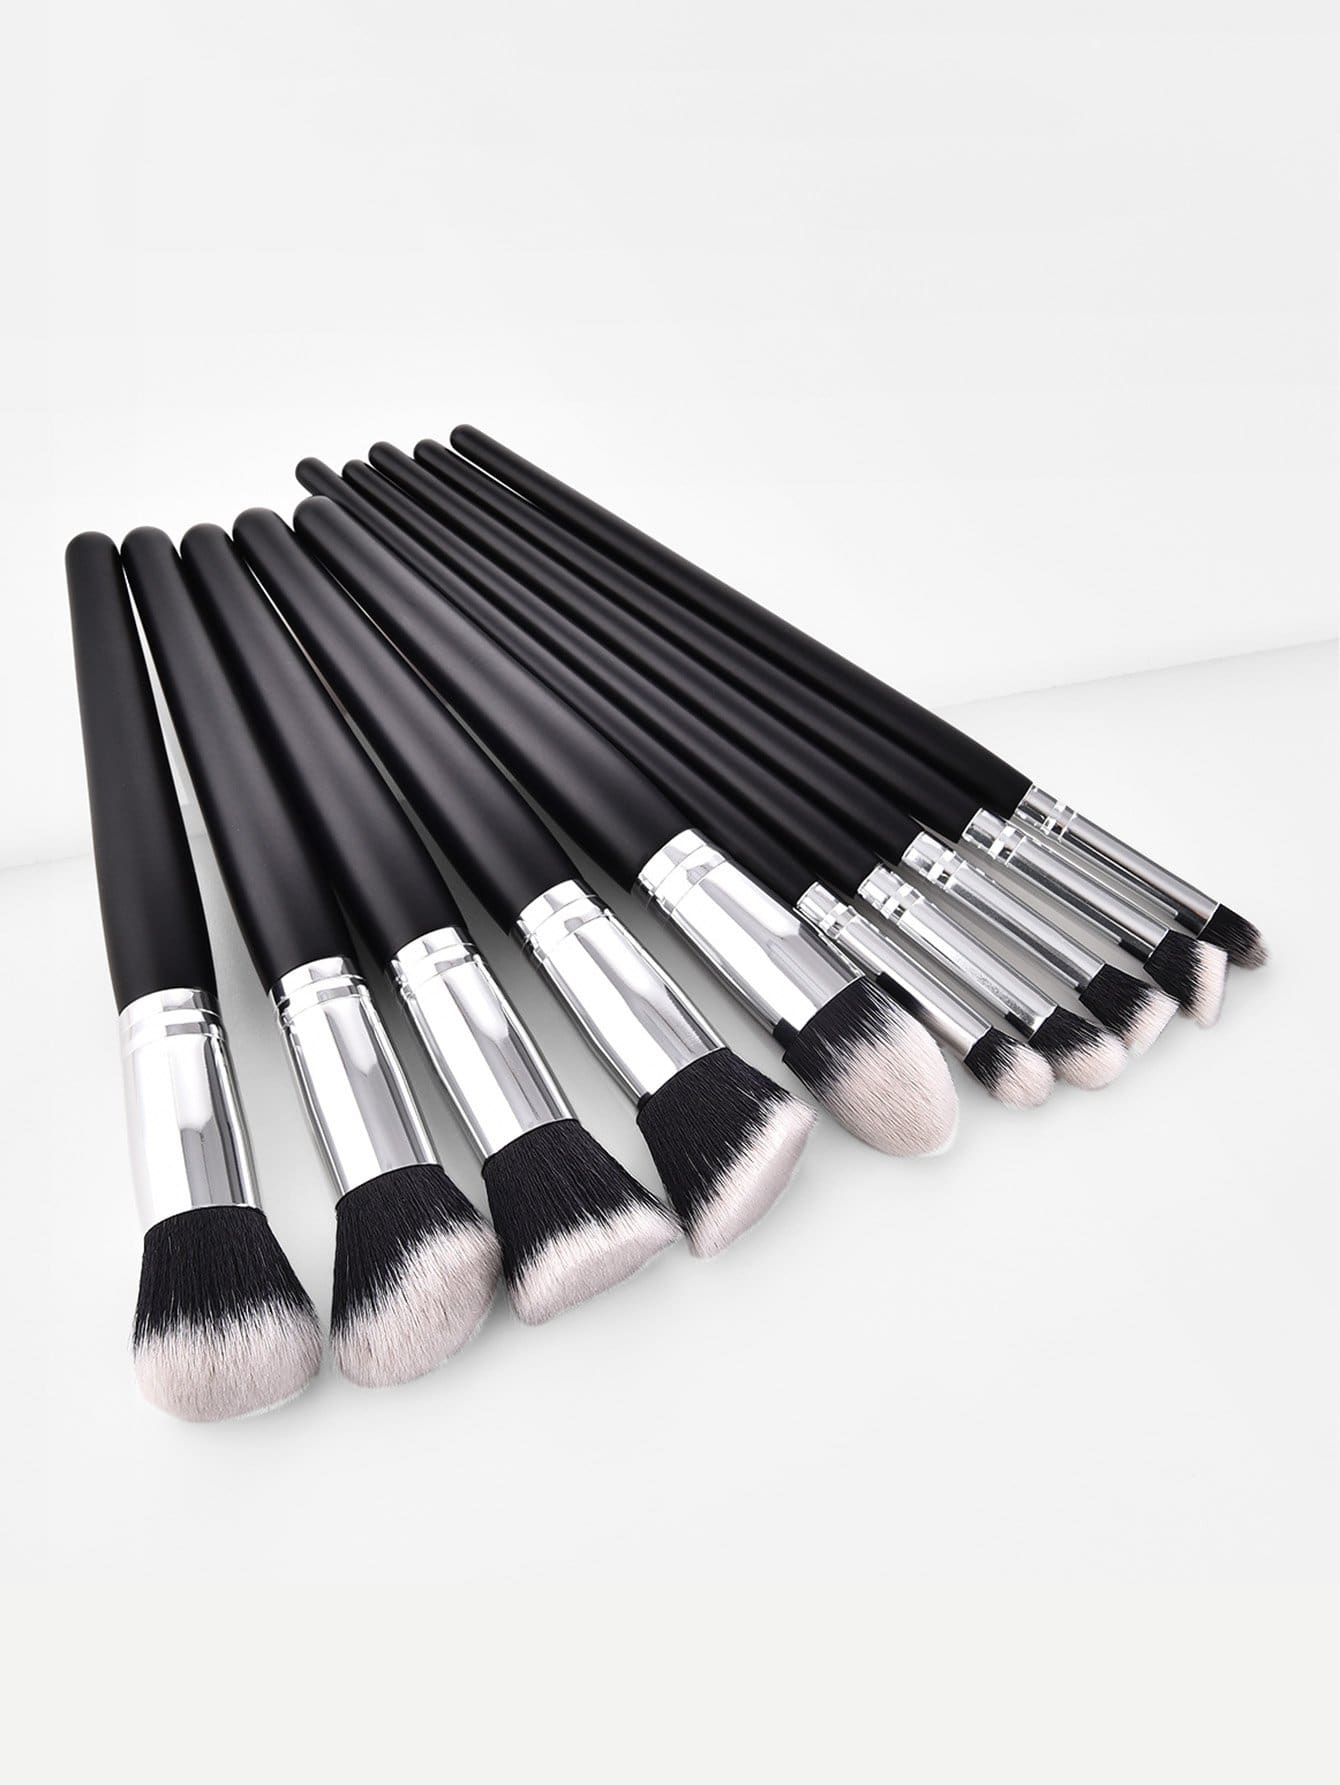 Professional Makeup Brush 10pcs free shipping 10pcs ba6998fp